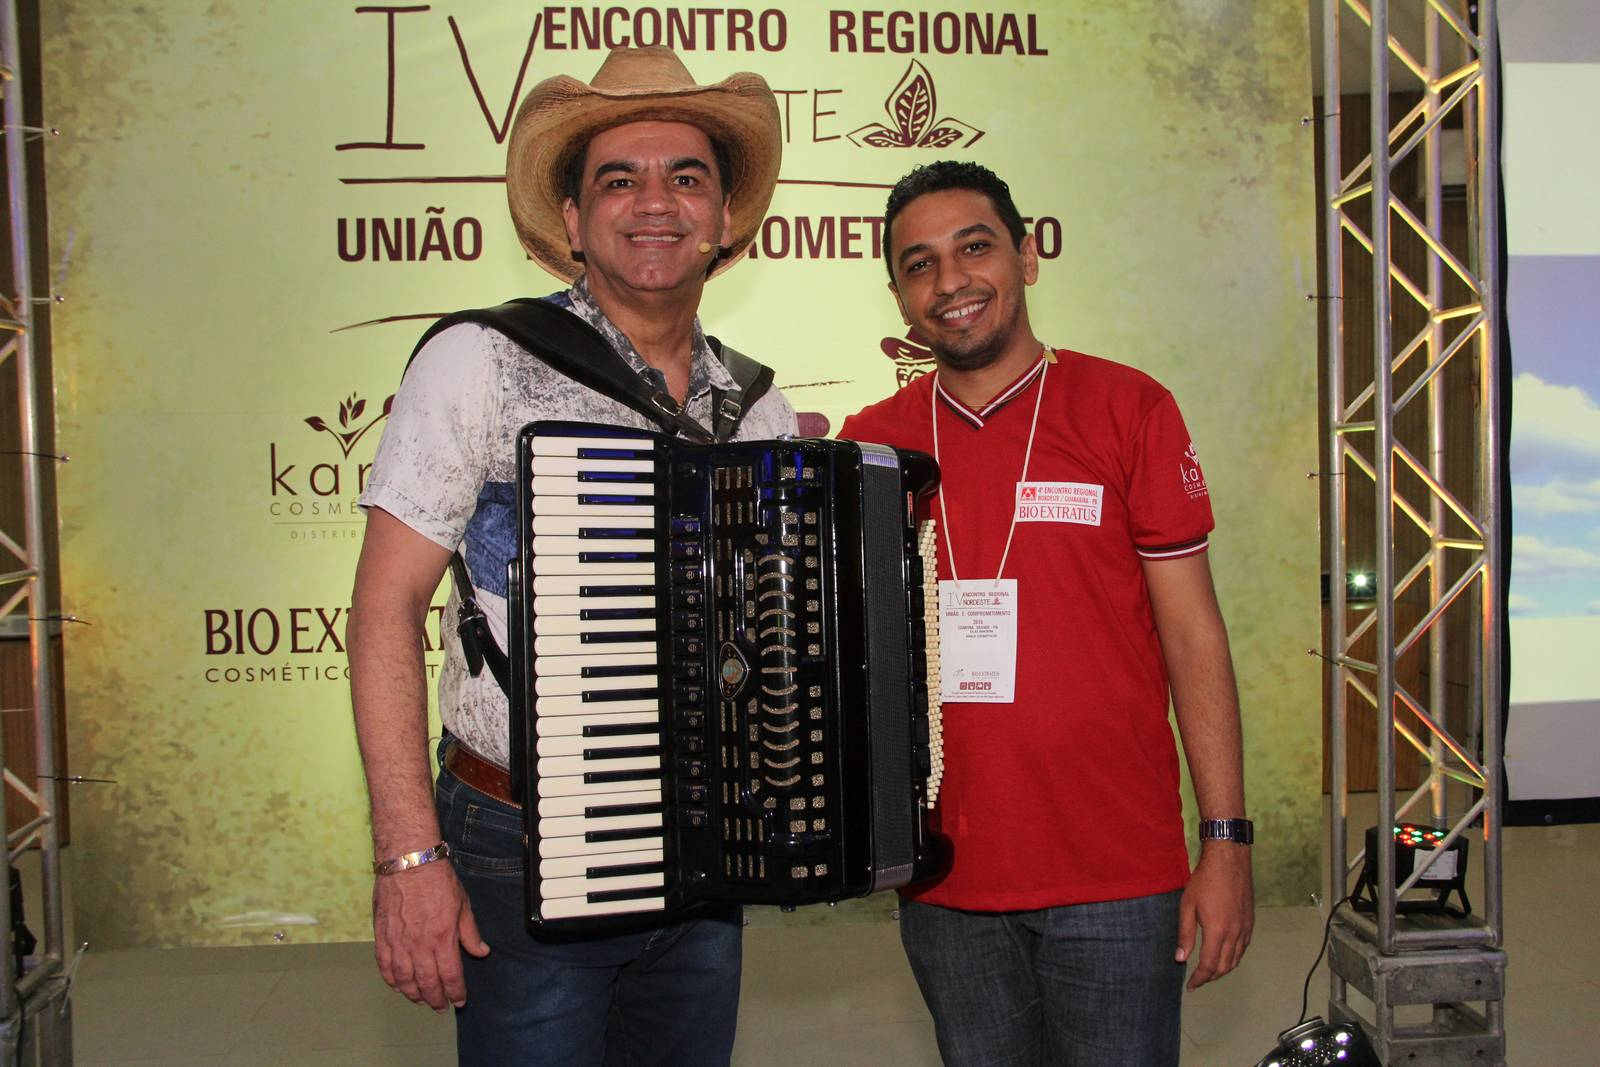 IV Encontro Regional do Nordeste - Bio Extratus (105)